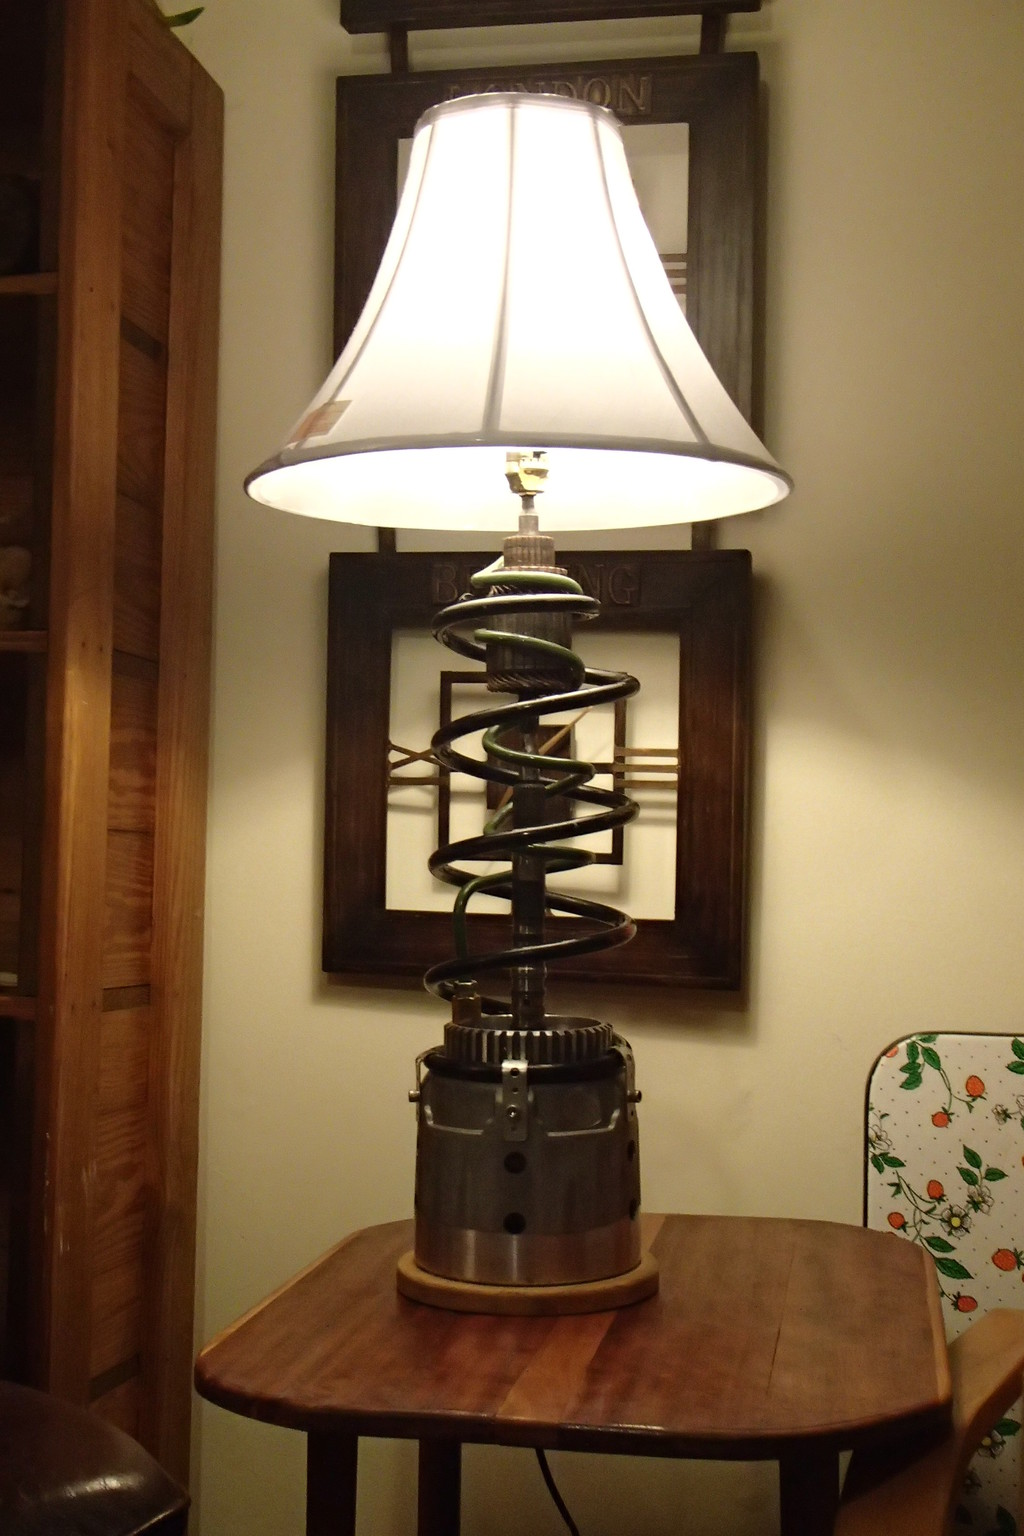 transmission coil spring lamp